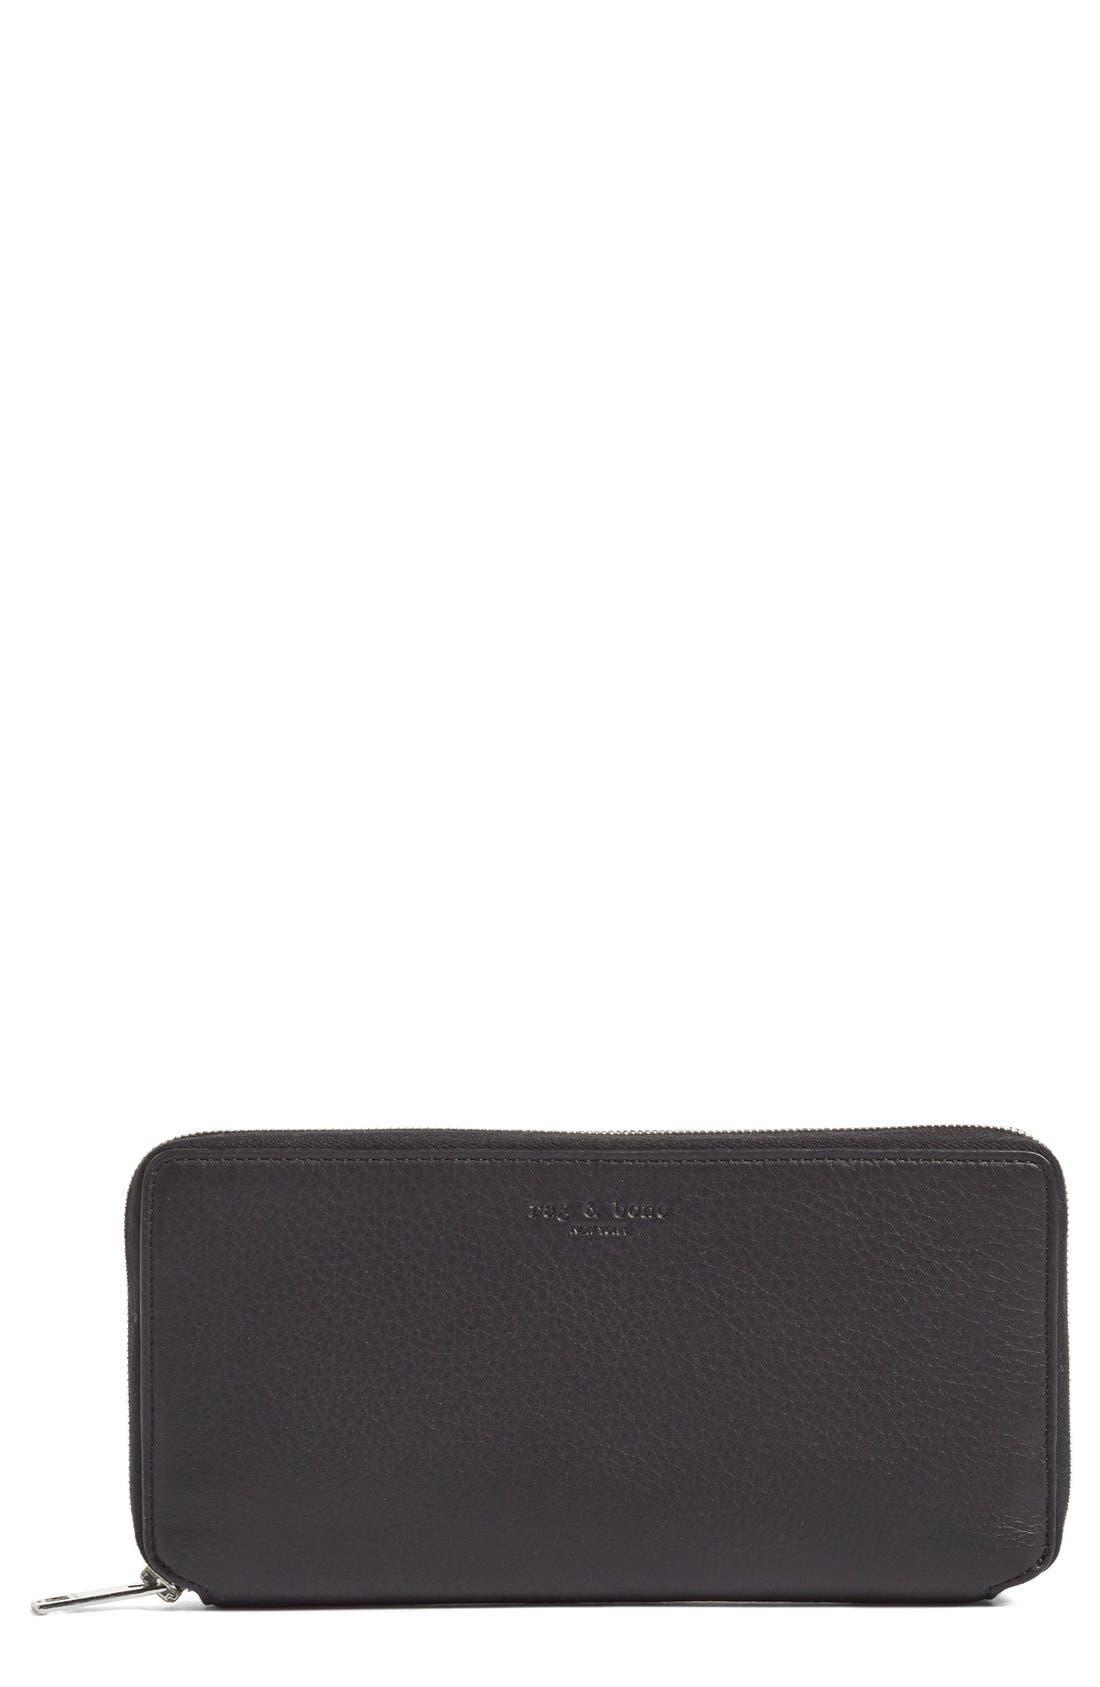 Leather Zip Around Wallet,                         Main,                         color, Black